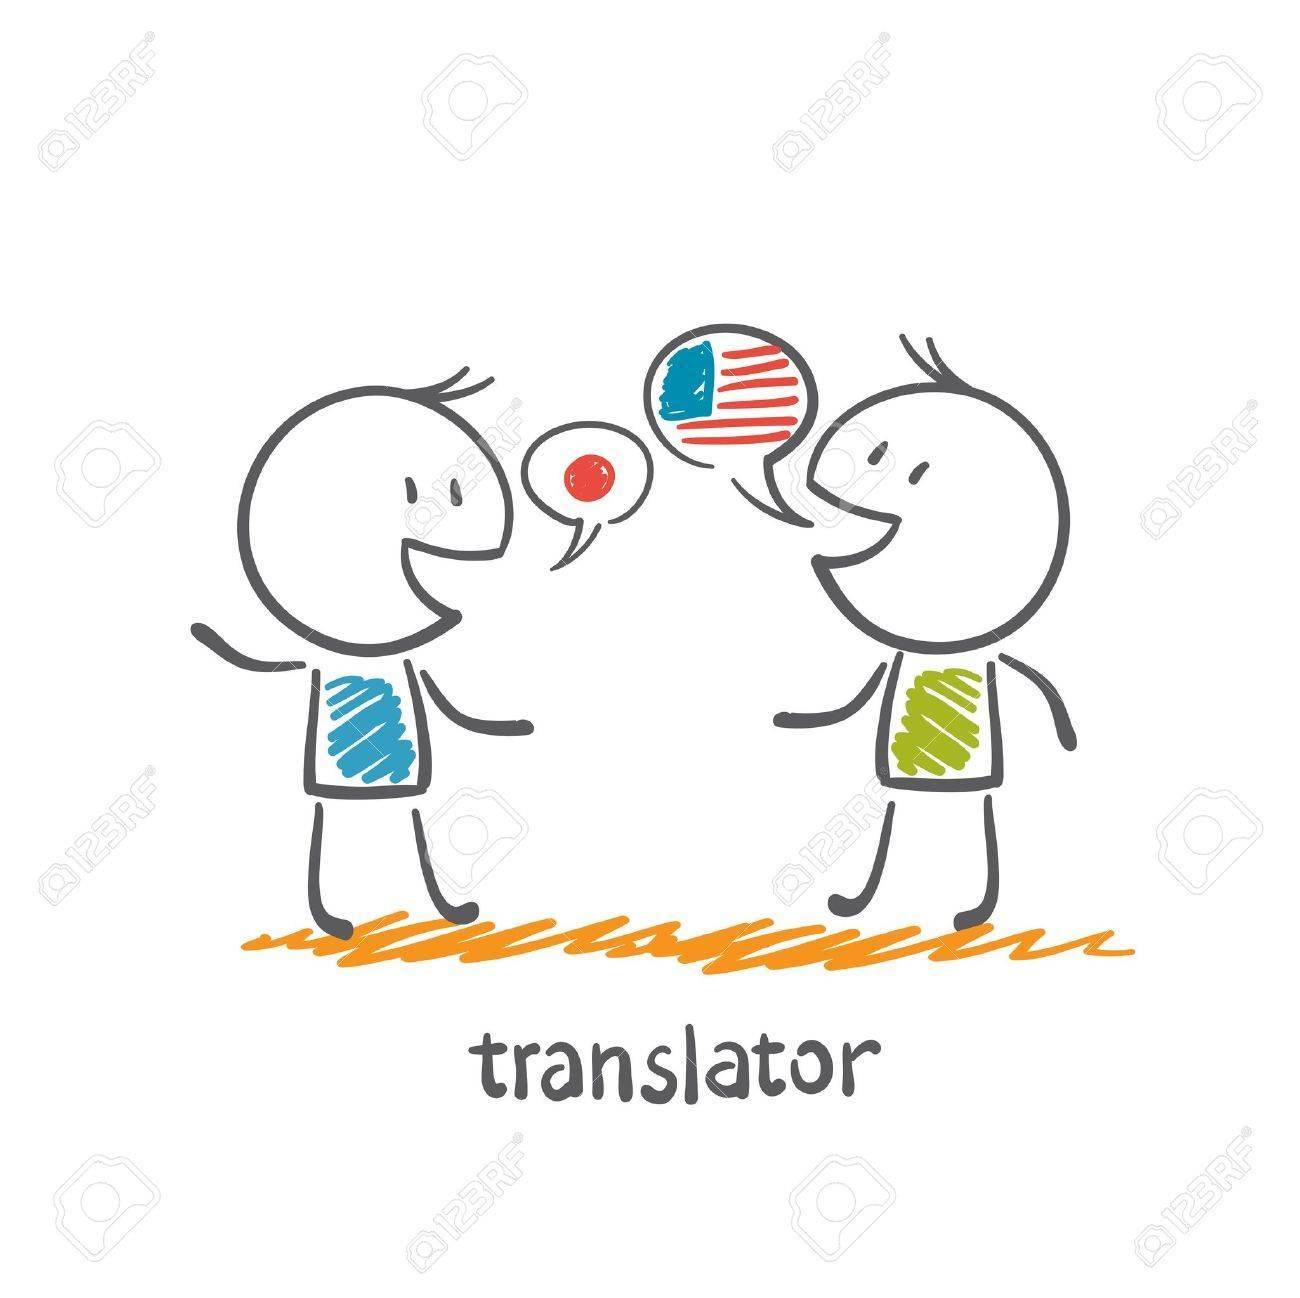 Translator clipart 7 » Clipart Portal.